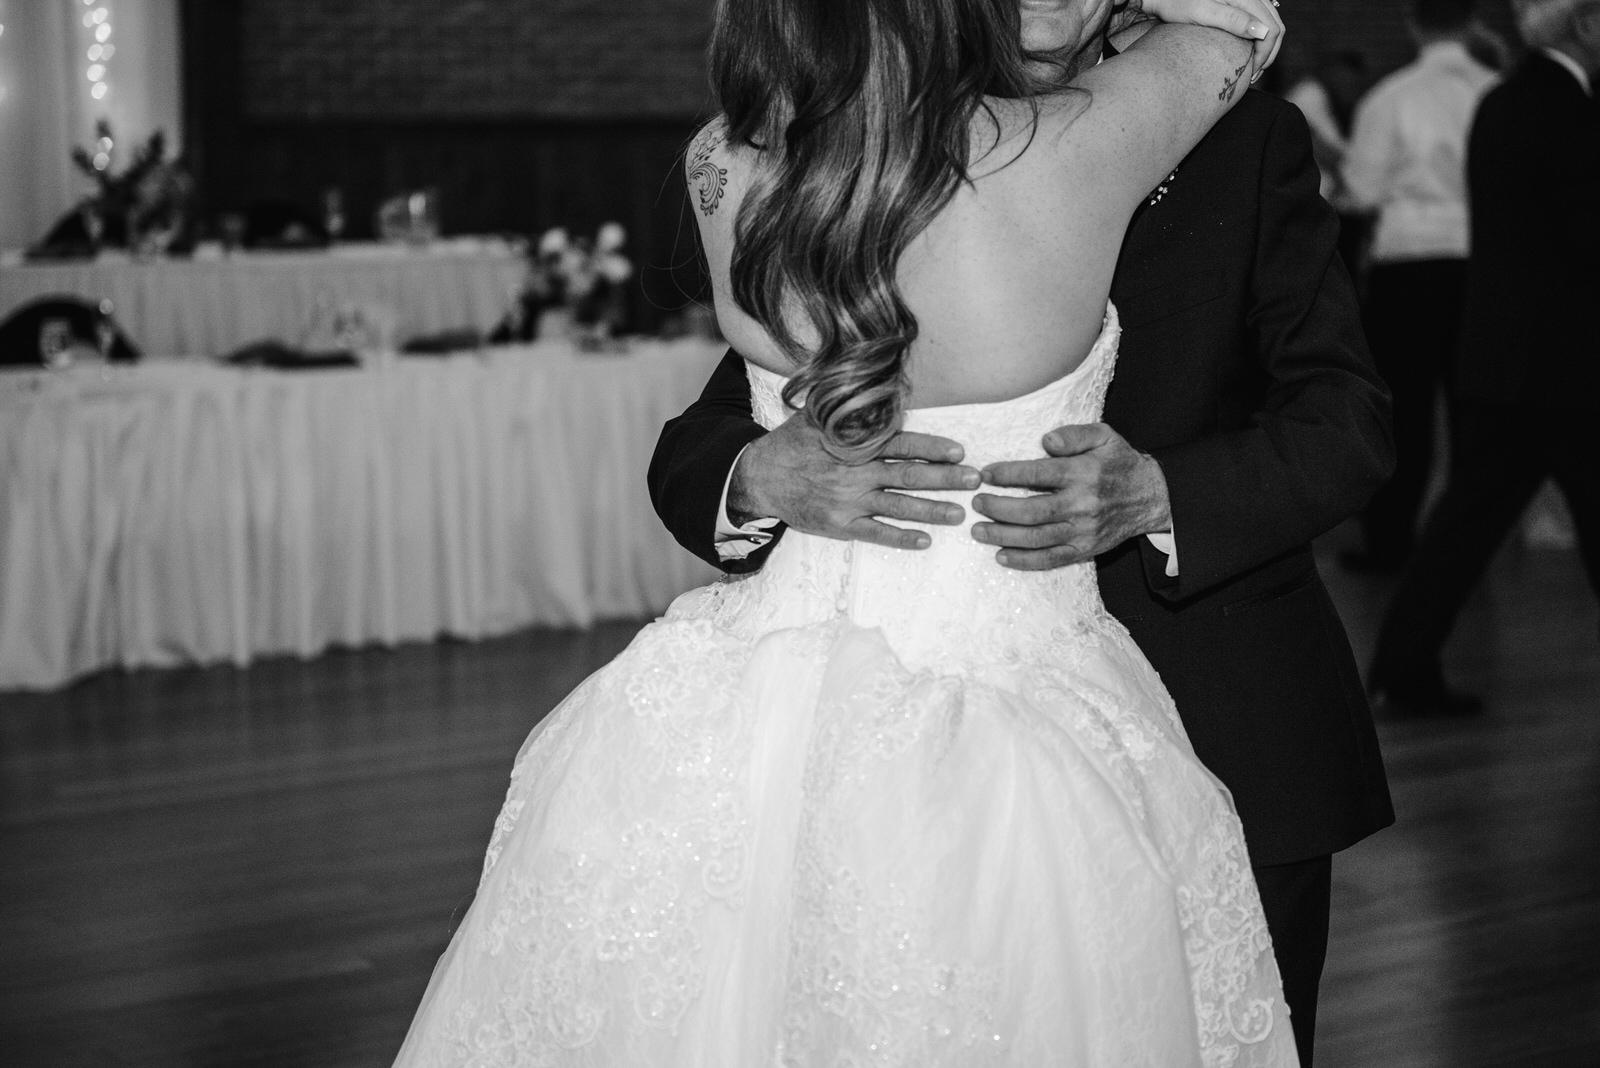 Laube_Banquet_Hall__Wedding_Photos_078.jpg